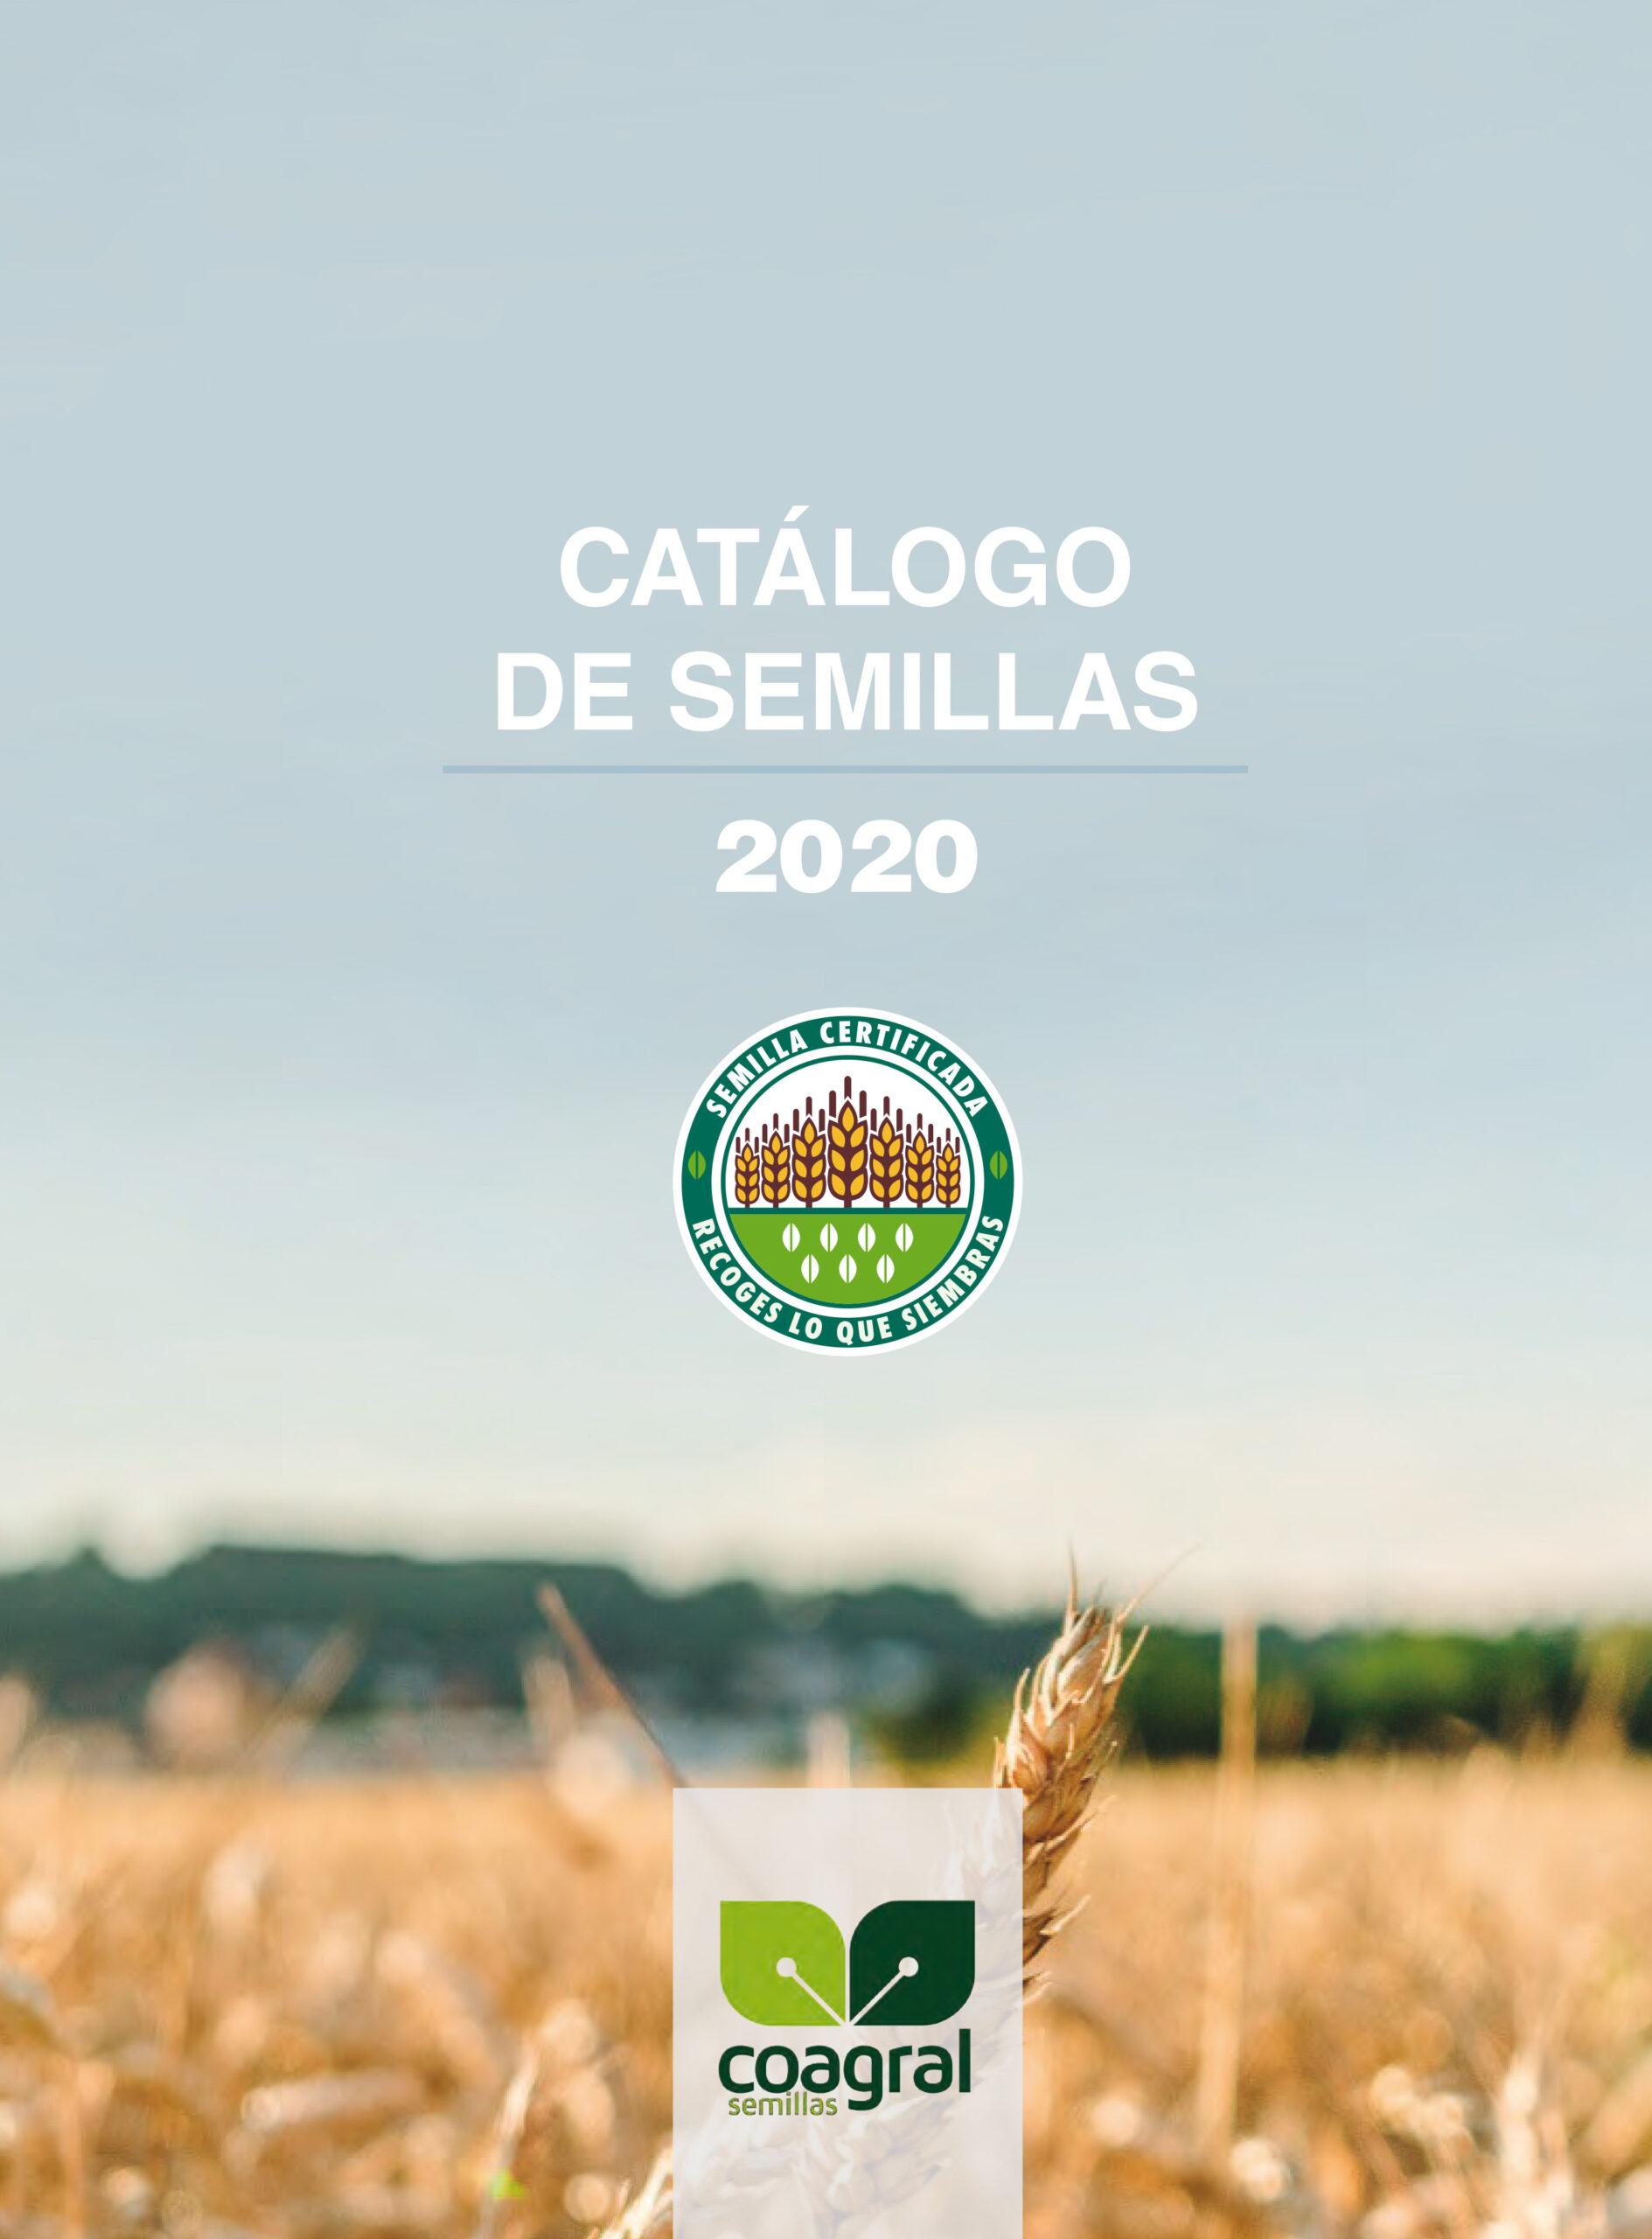 Catálogo de Semillas APAG-Coagral 2020